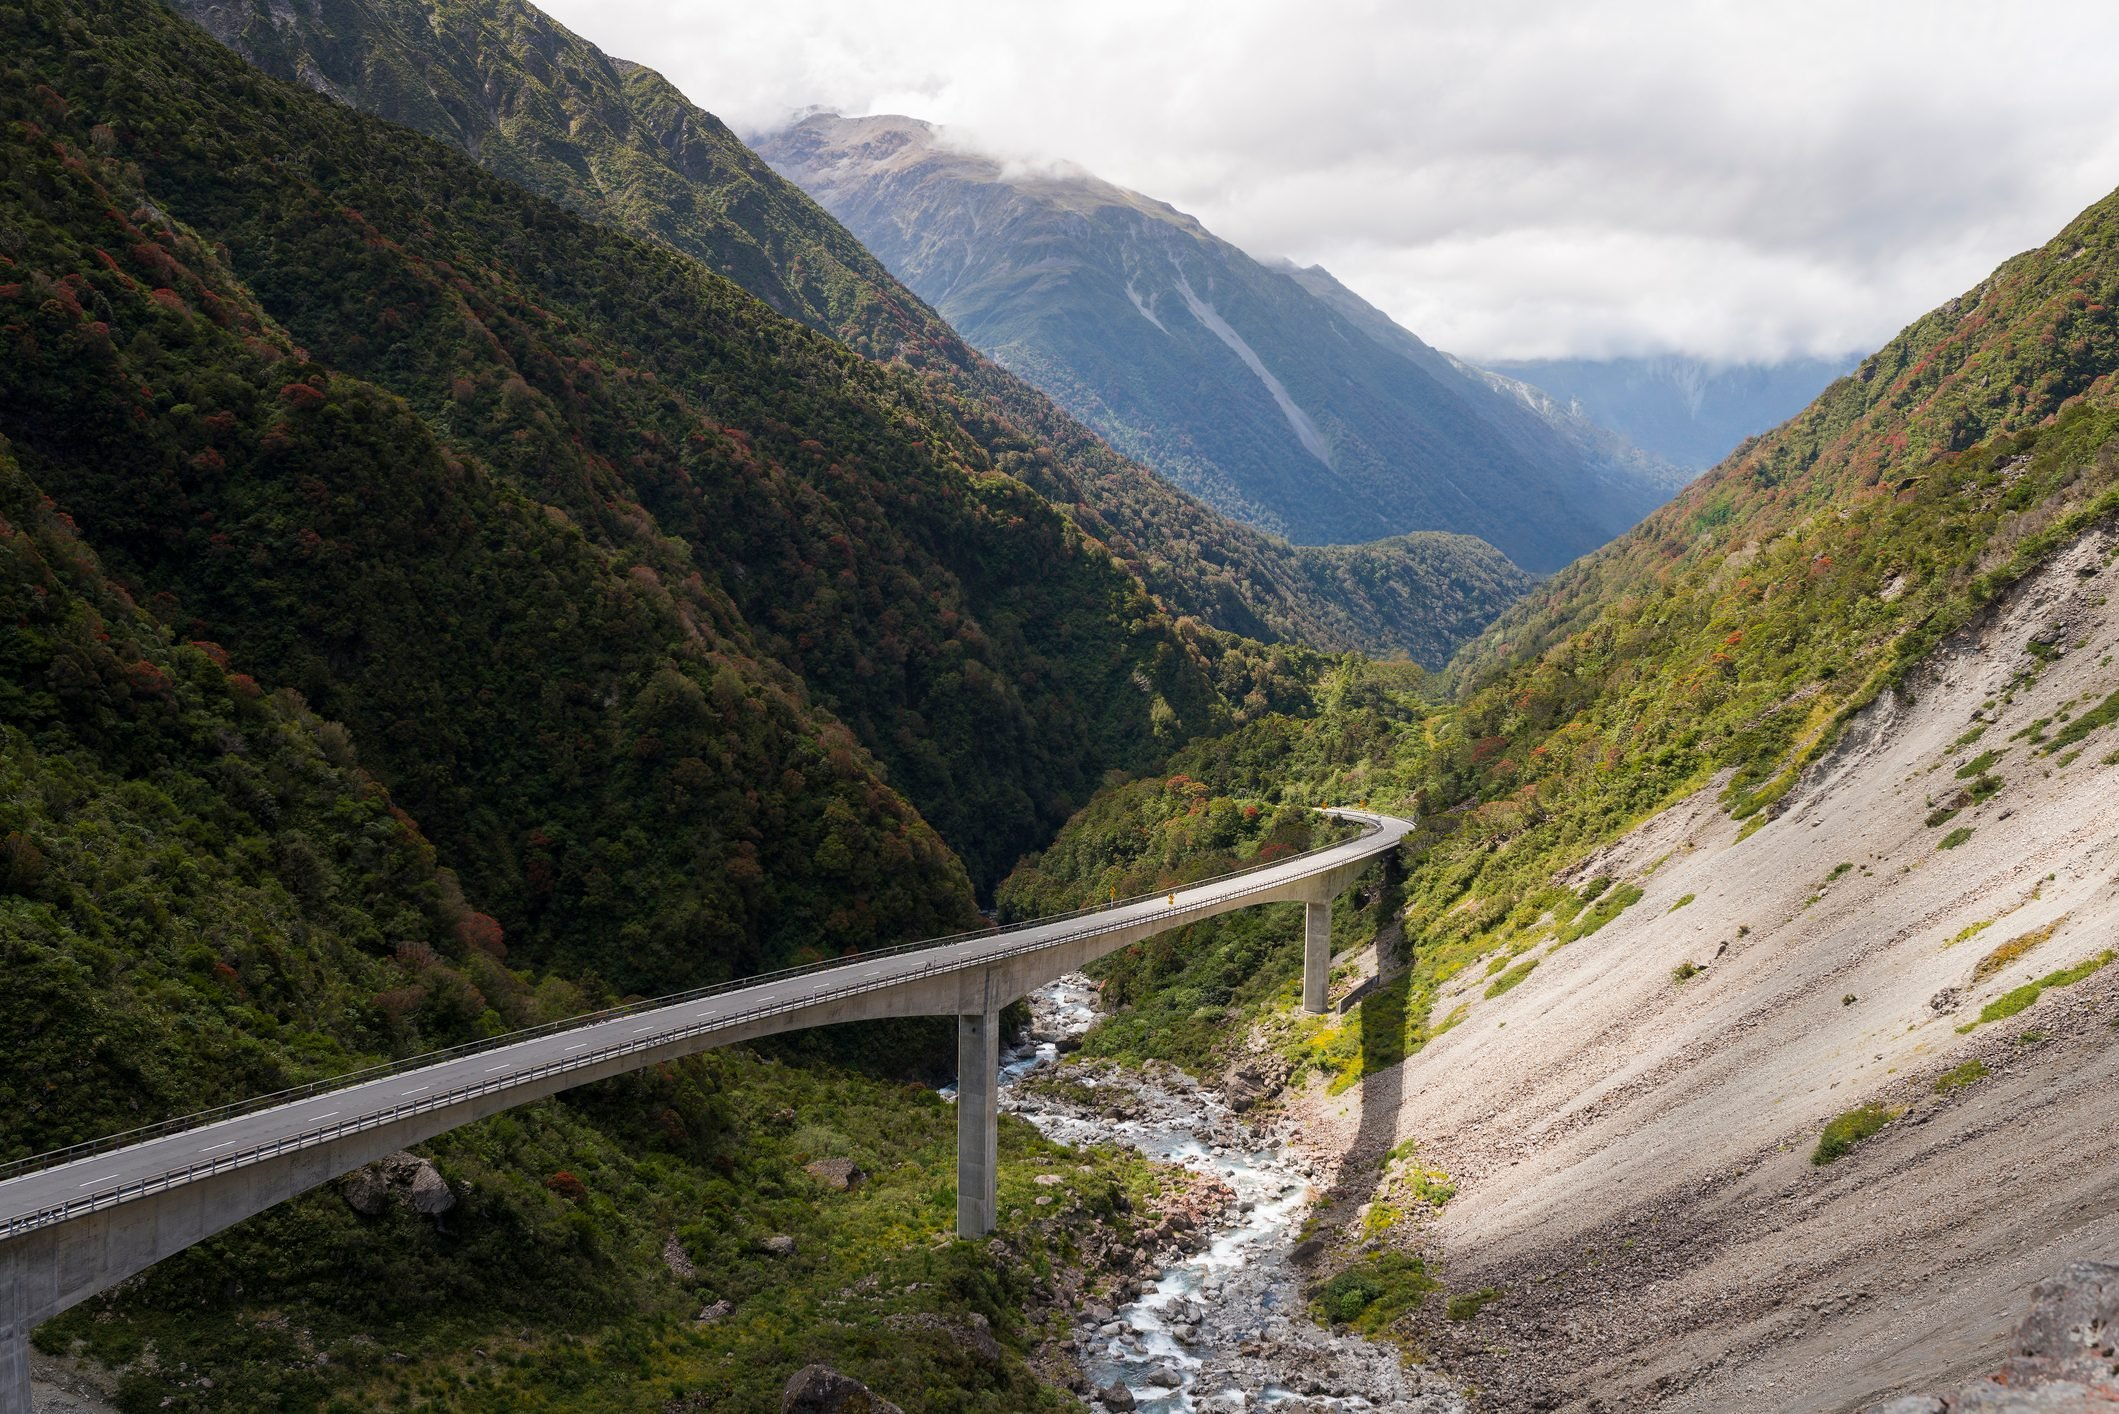 New Zealand, South Island, Southern Alps, Arthur's Pass Bridge